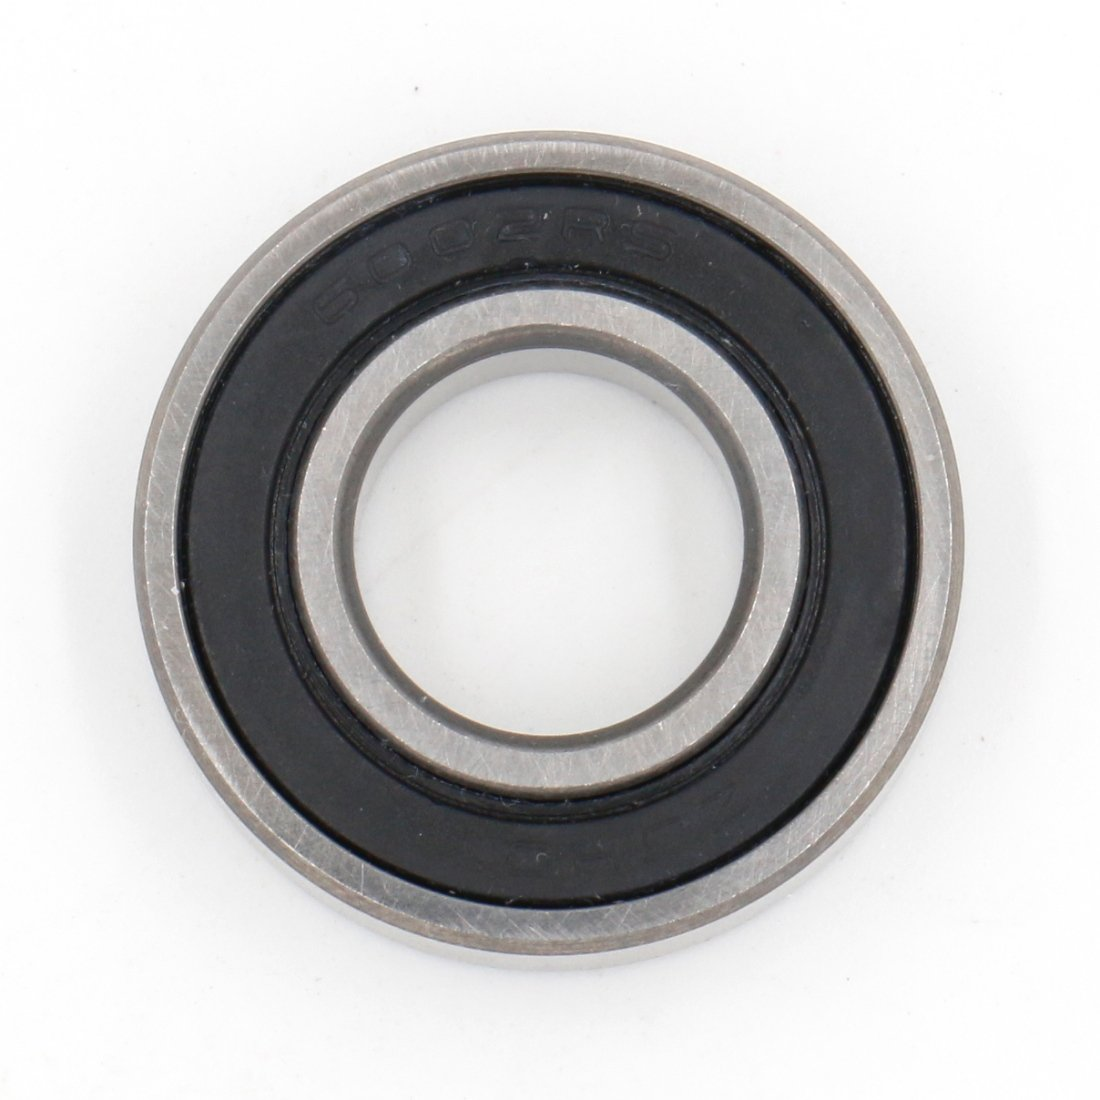 Baomain ball bearing 6002-2RS Sealed Bearing 15mm x 32mm x 9mm Baomain Electric Co. Ltd